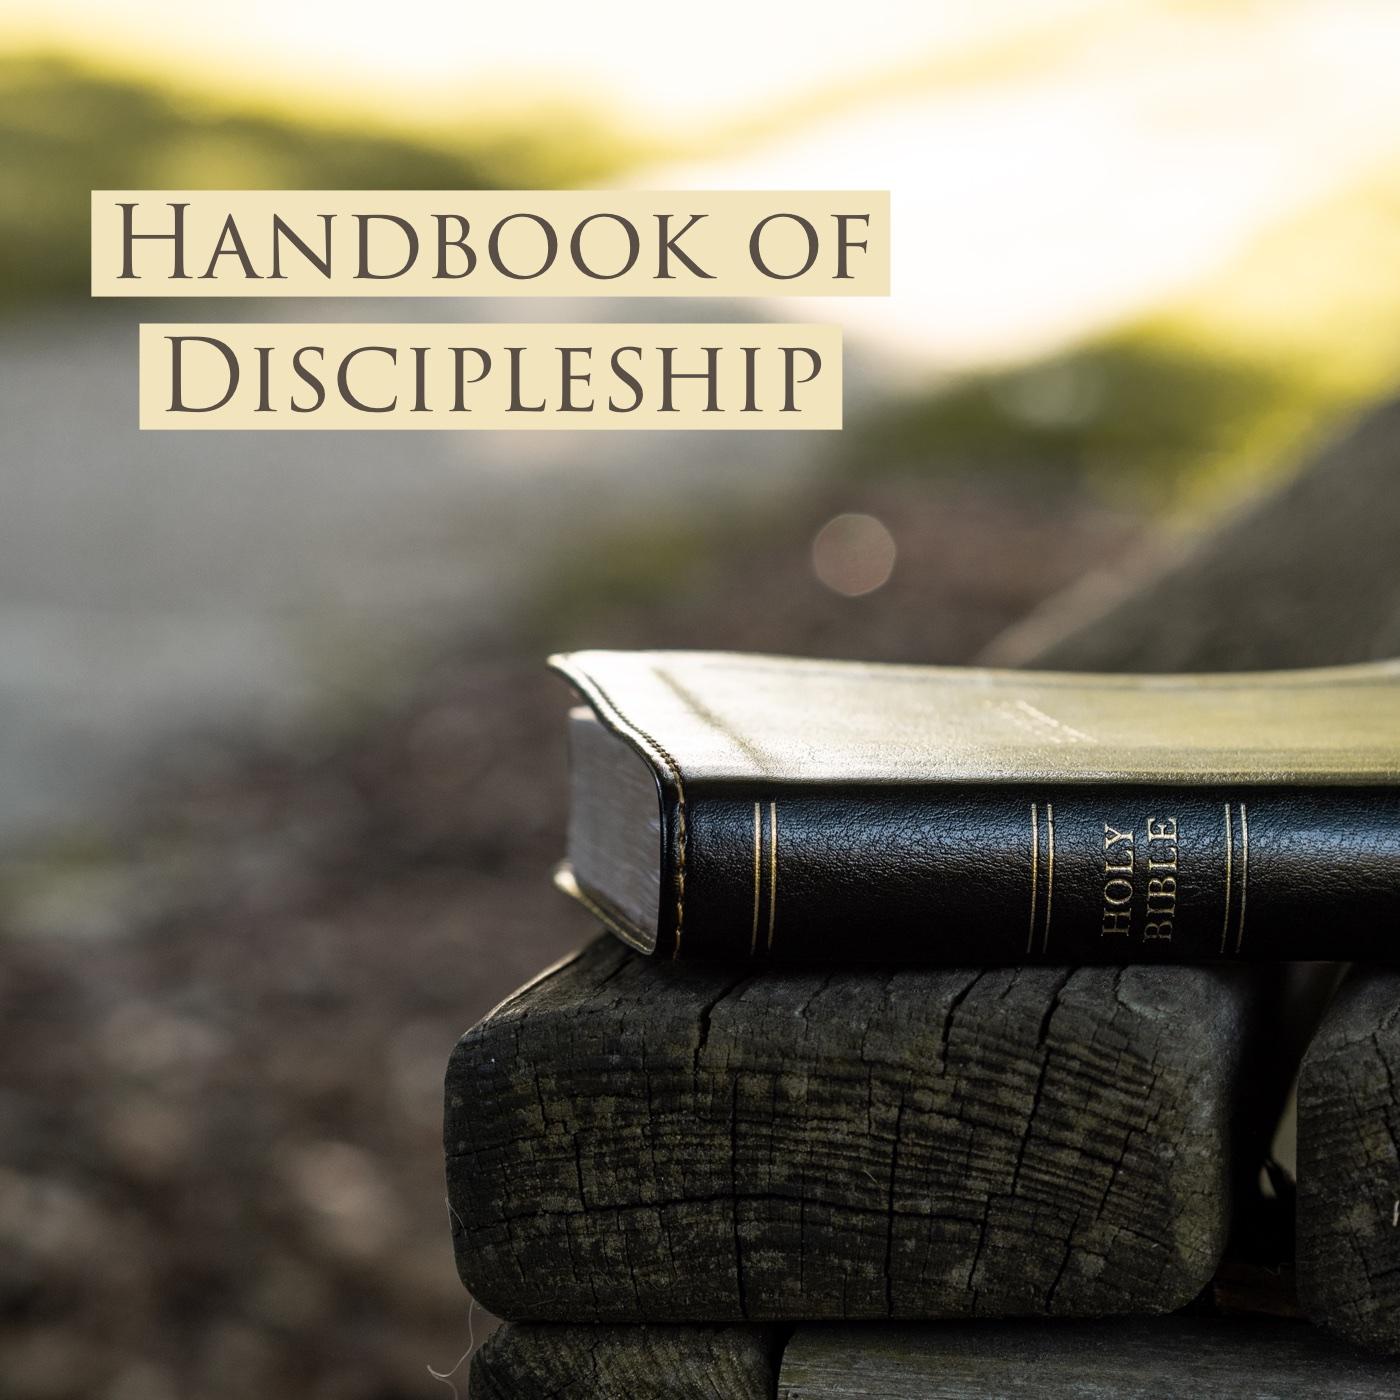 Handbook of Discipleship